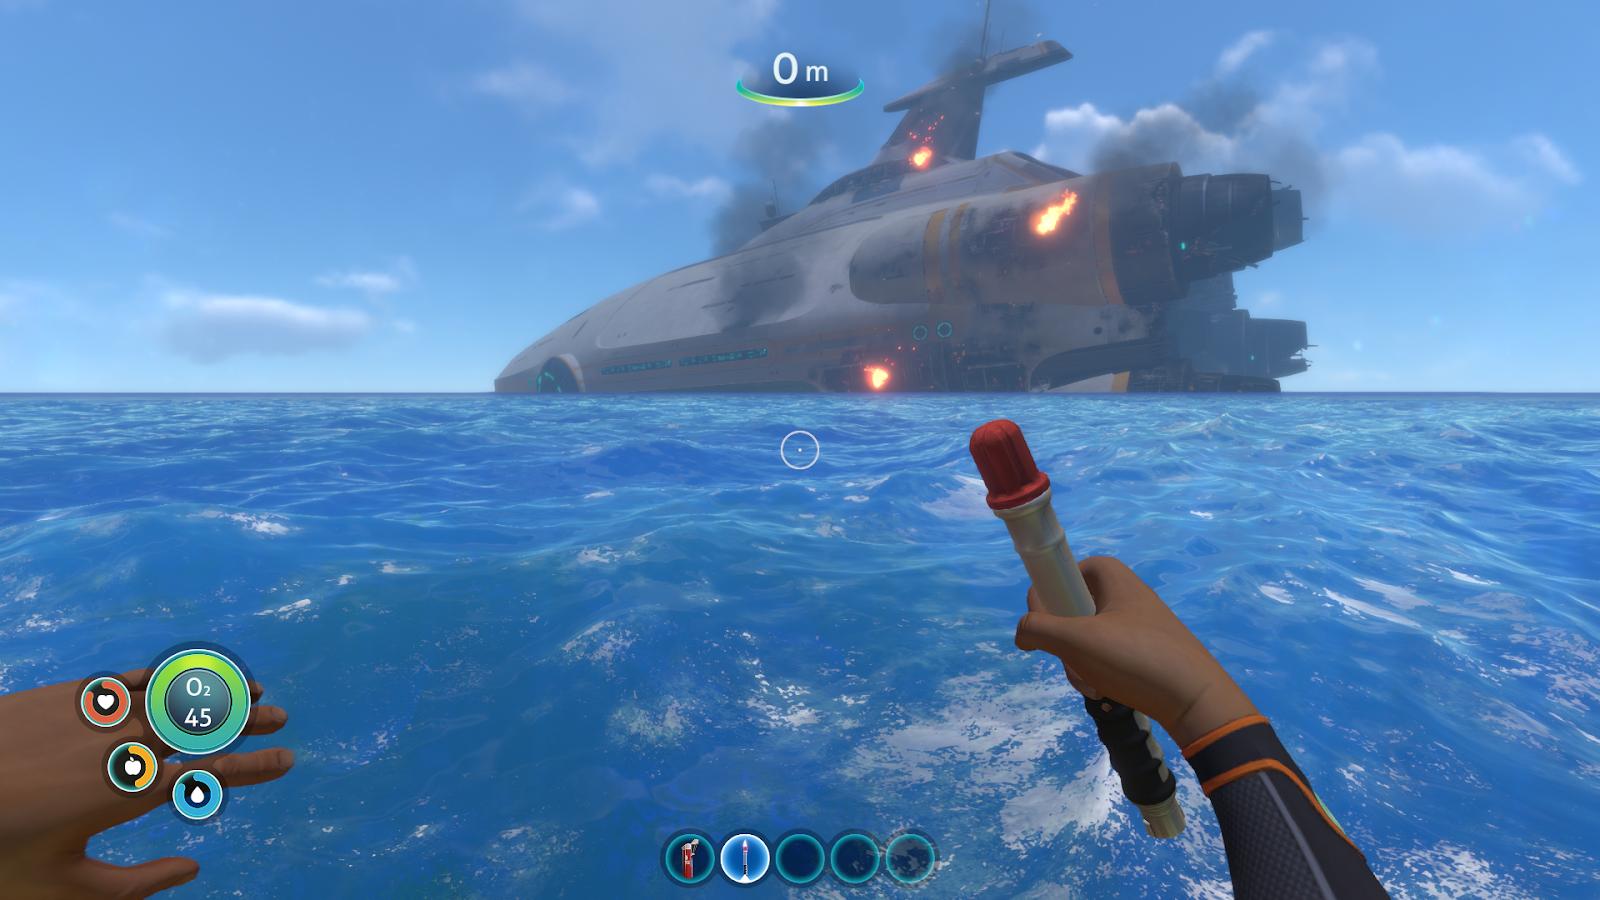 Hunter On Games Subnautica Analysis